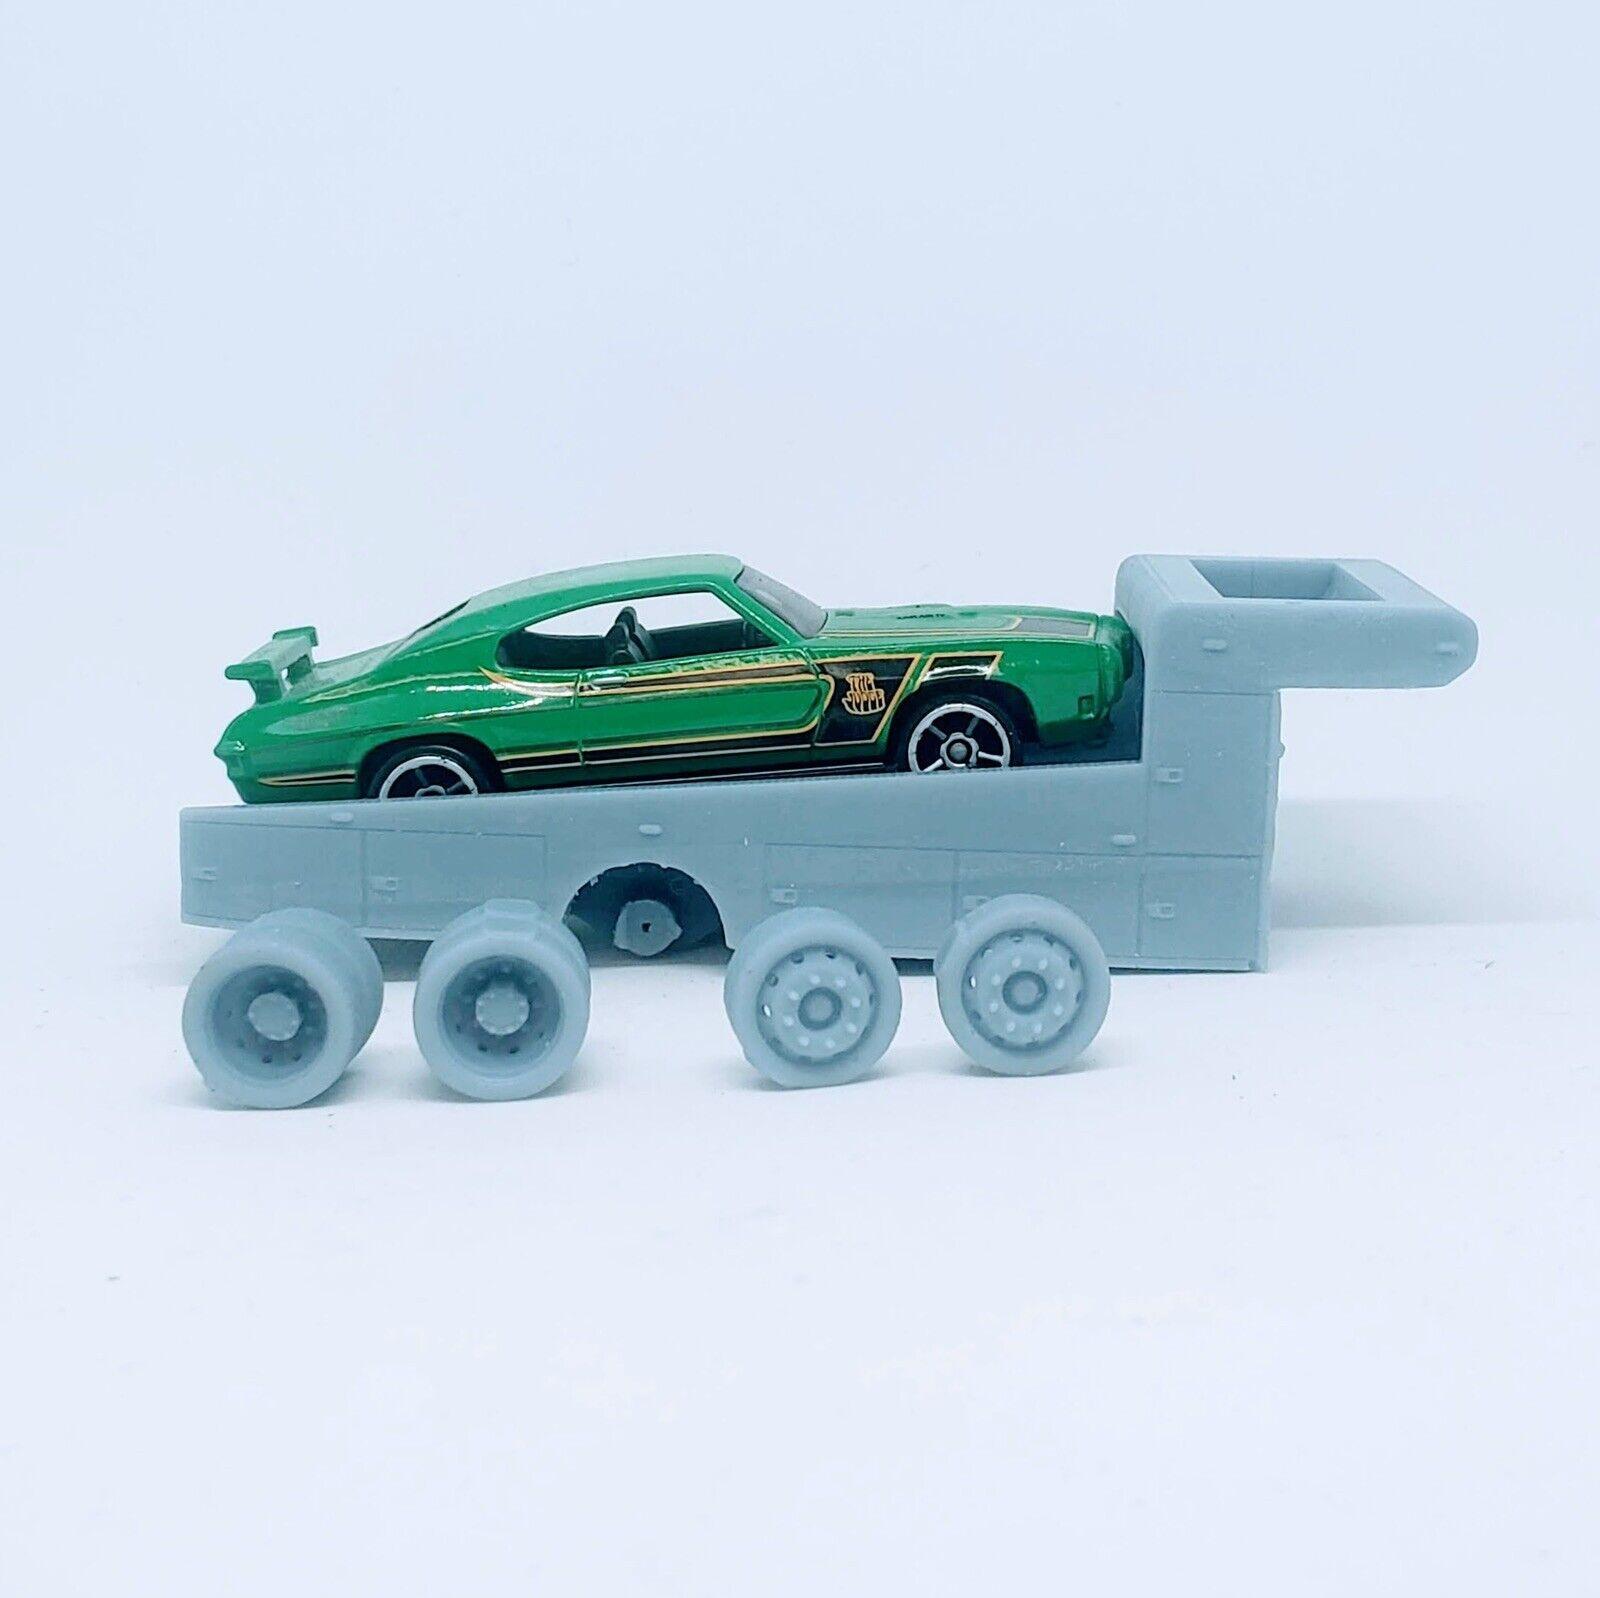 Ramp Truck 1:64 Scale Custom Accessory For Hot Wheels